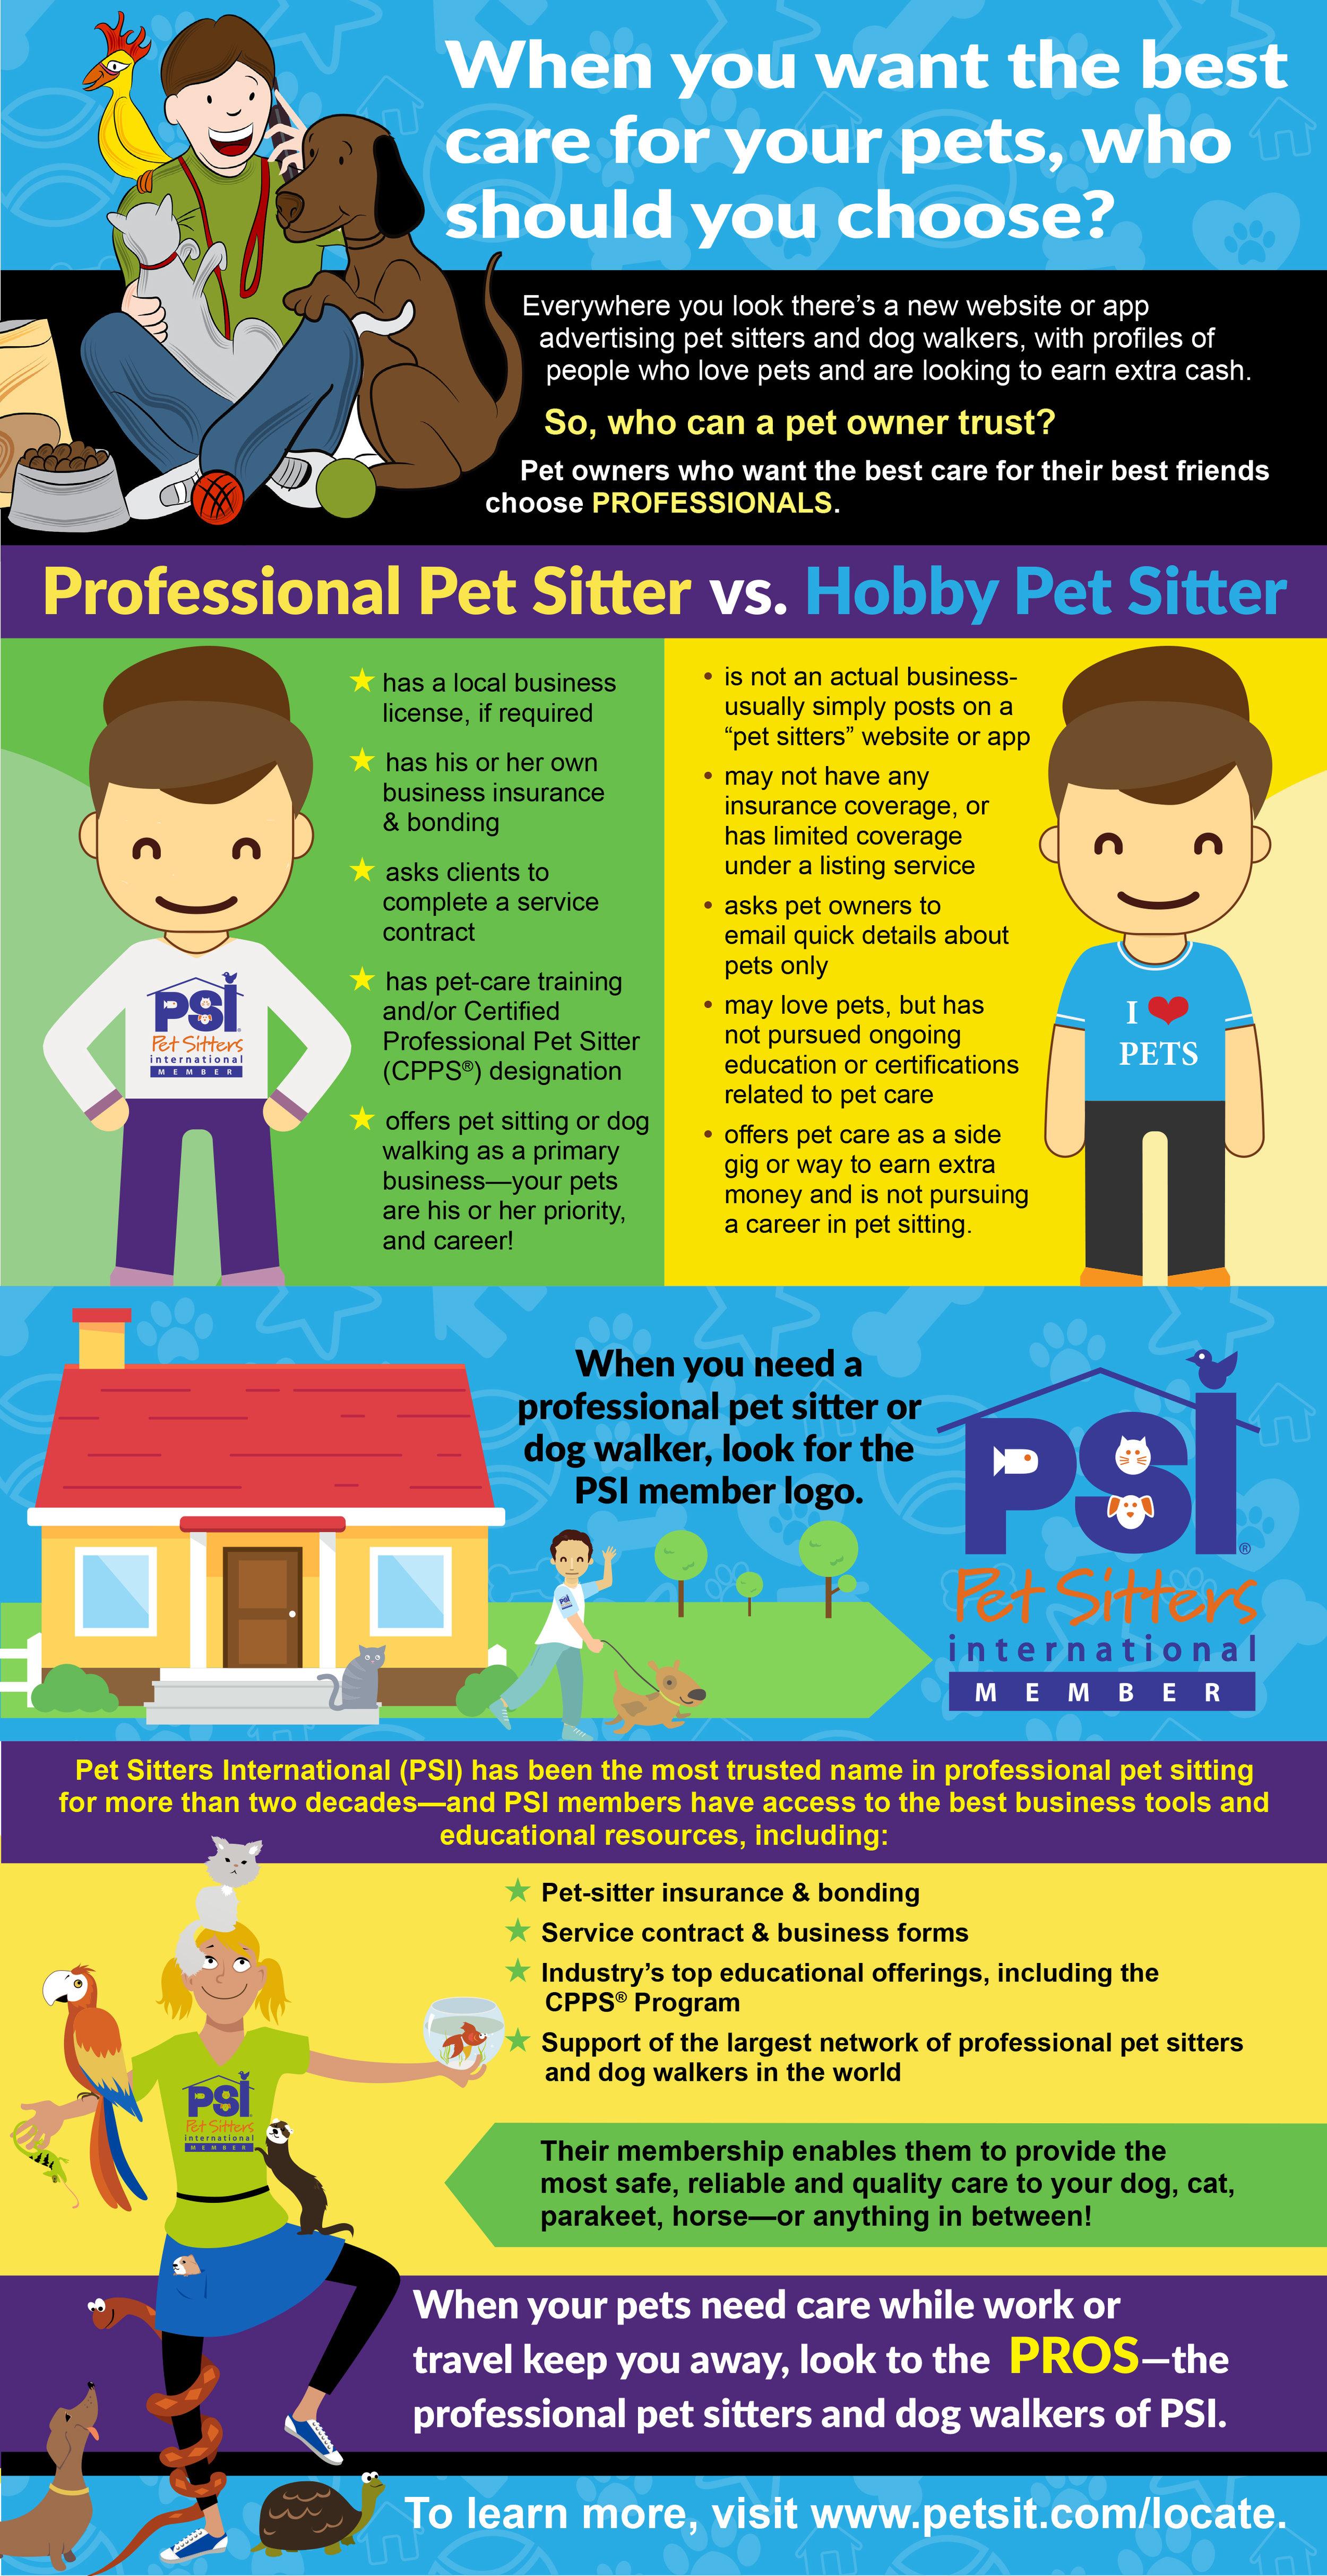 Choosing-a-professional-pet-sitter-infographic.jpg